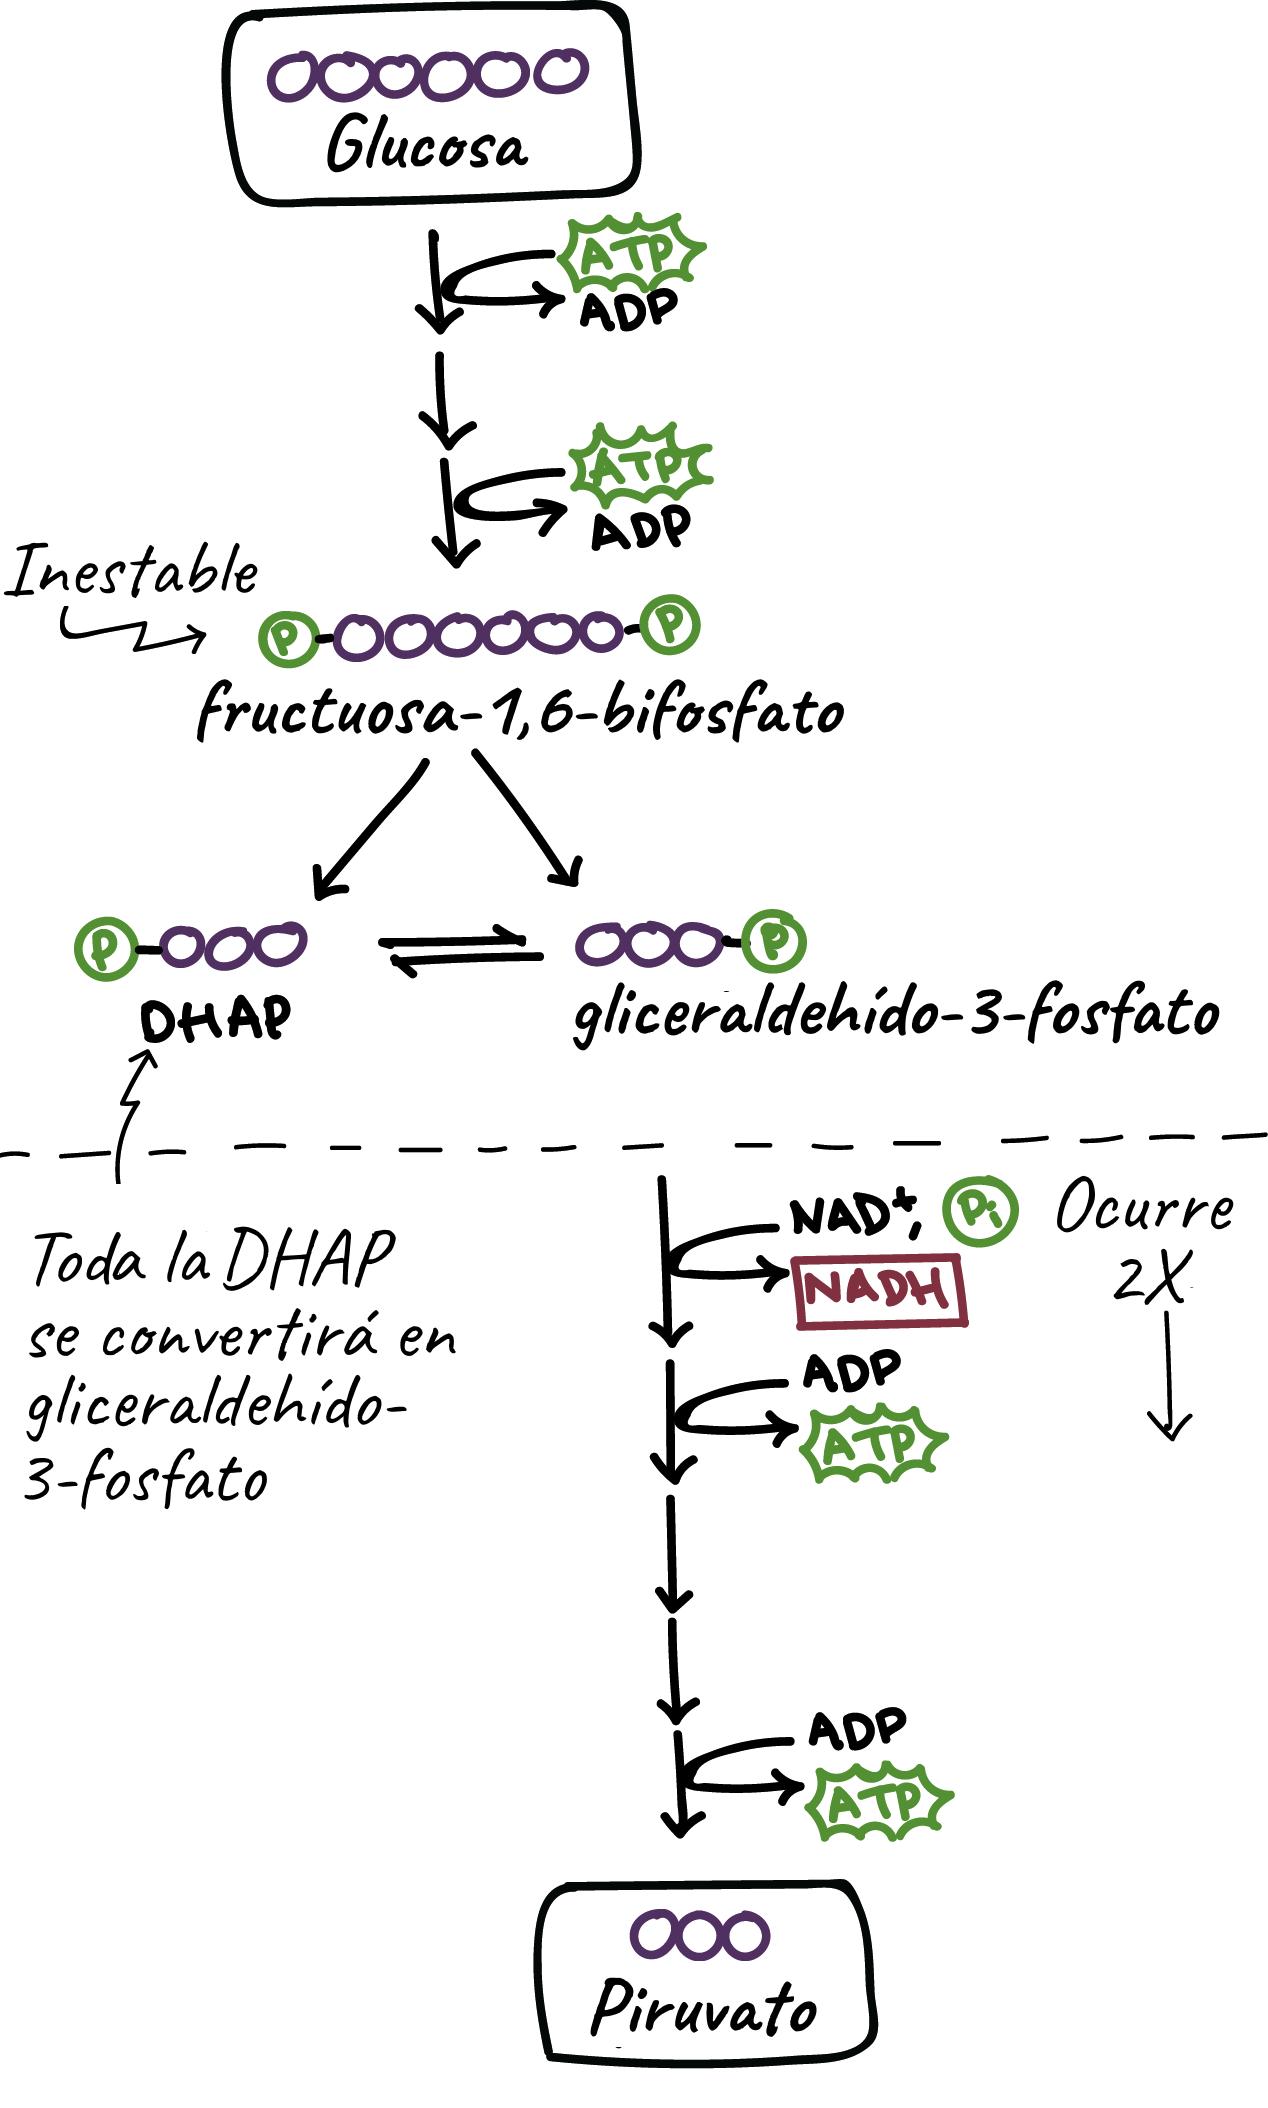 Glycolysis | Cellular respiration | Biology (artículo) | Khan Academy